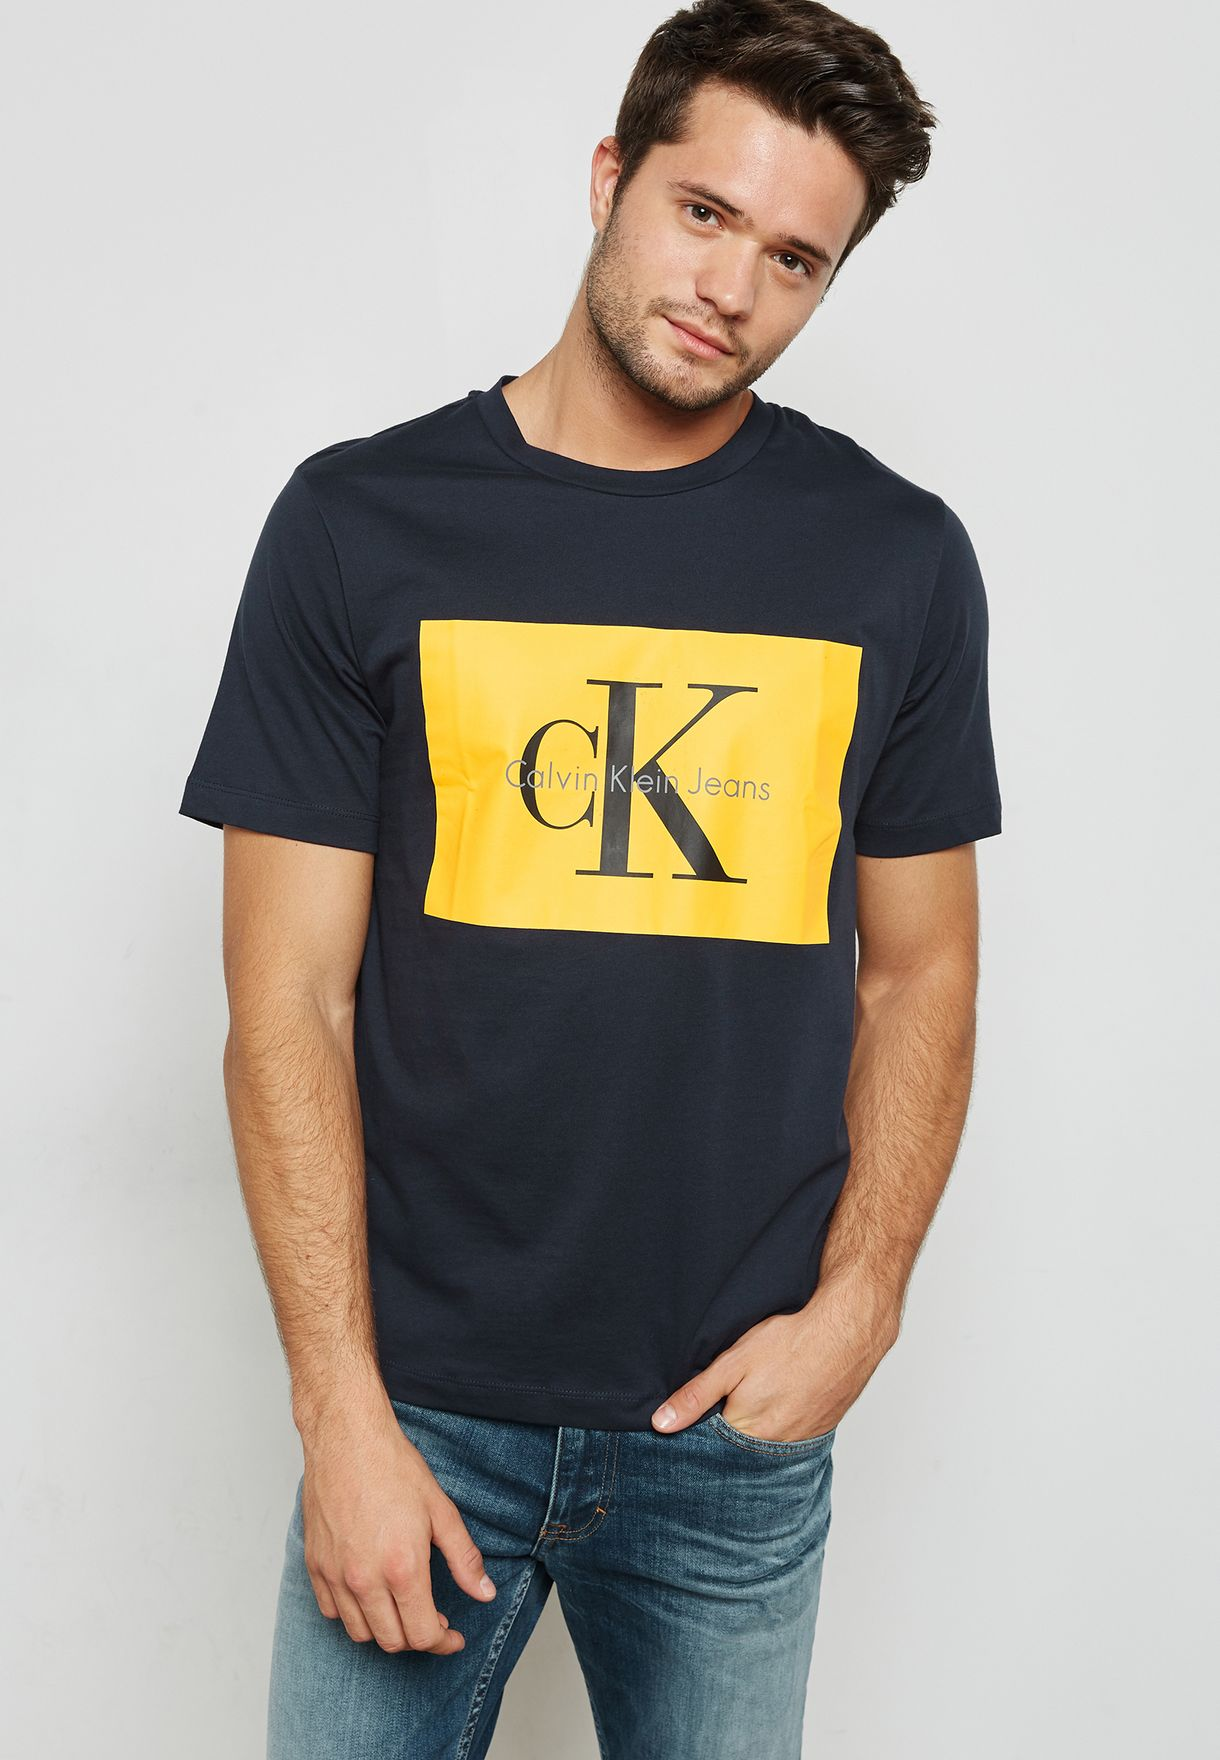 5f3bdcff33a Shop Calvin Klein Jeans navy Slim Fit Box Logo Tee J30J307427 for ...